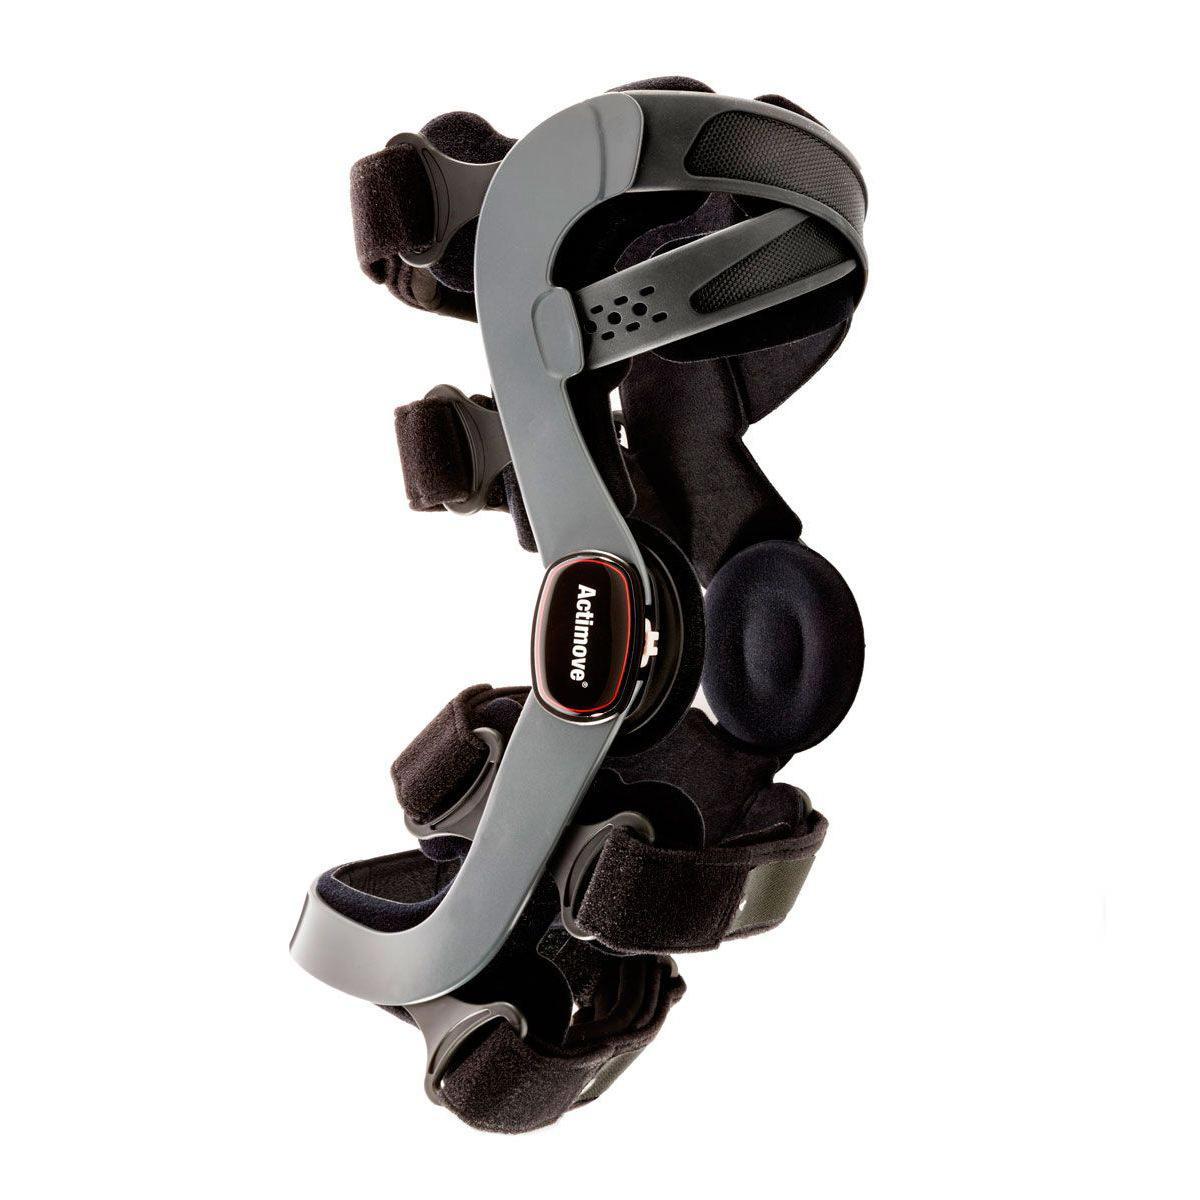 Actimove Step Thru Dynamic Thigh Cuff Functional Knee Brace, Black